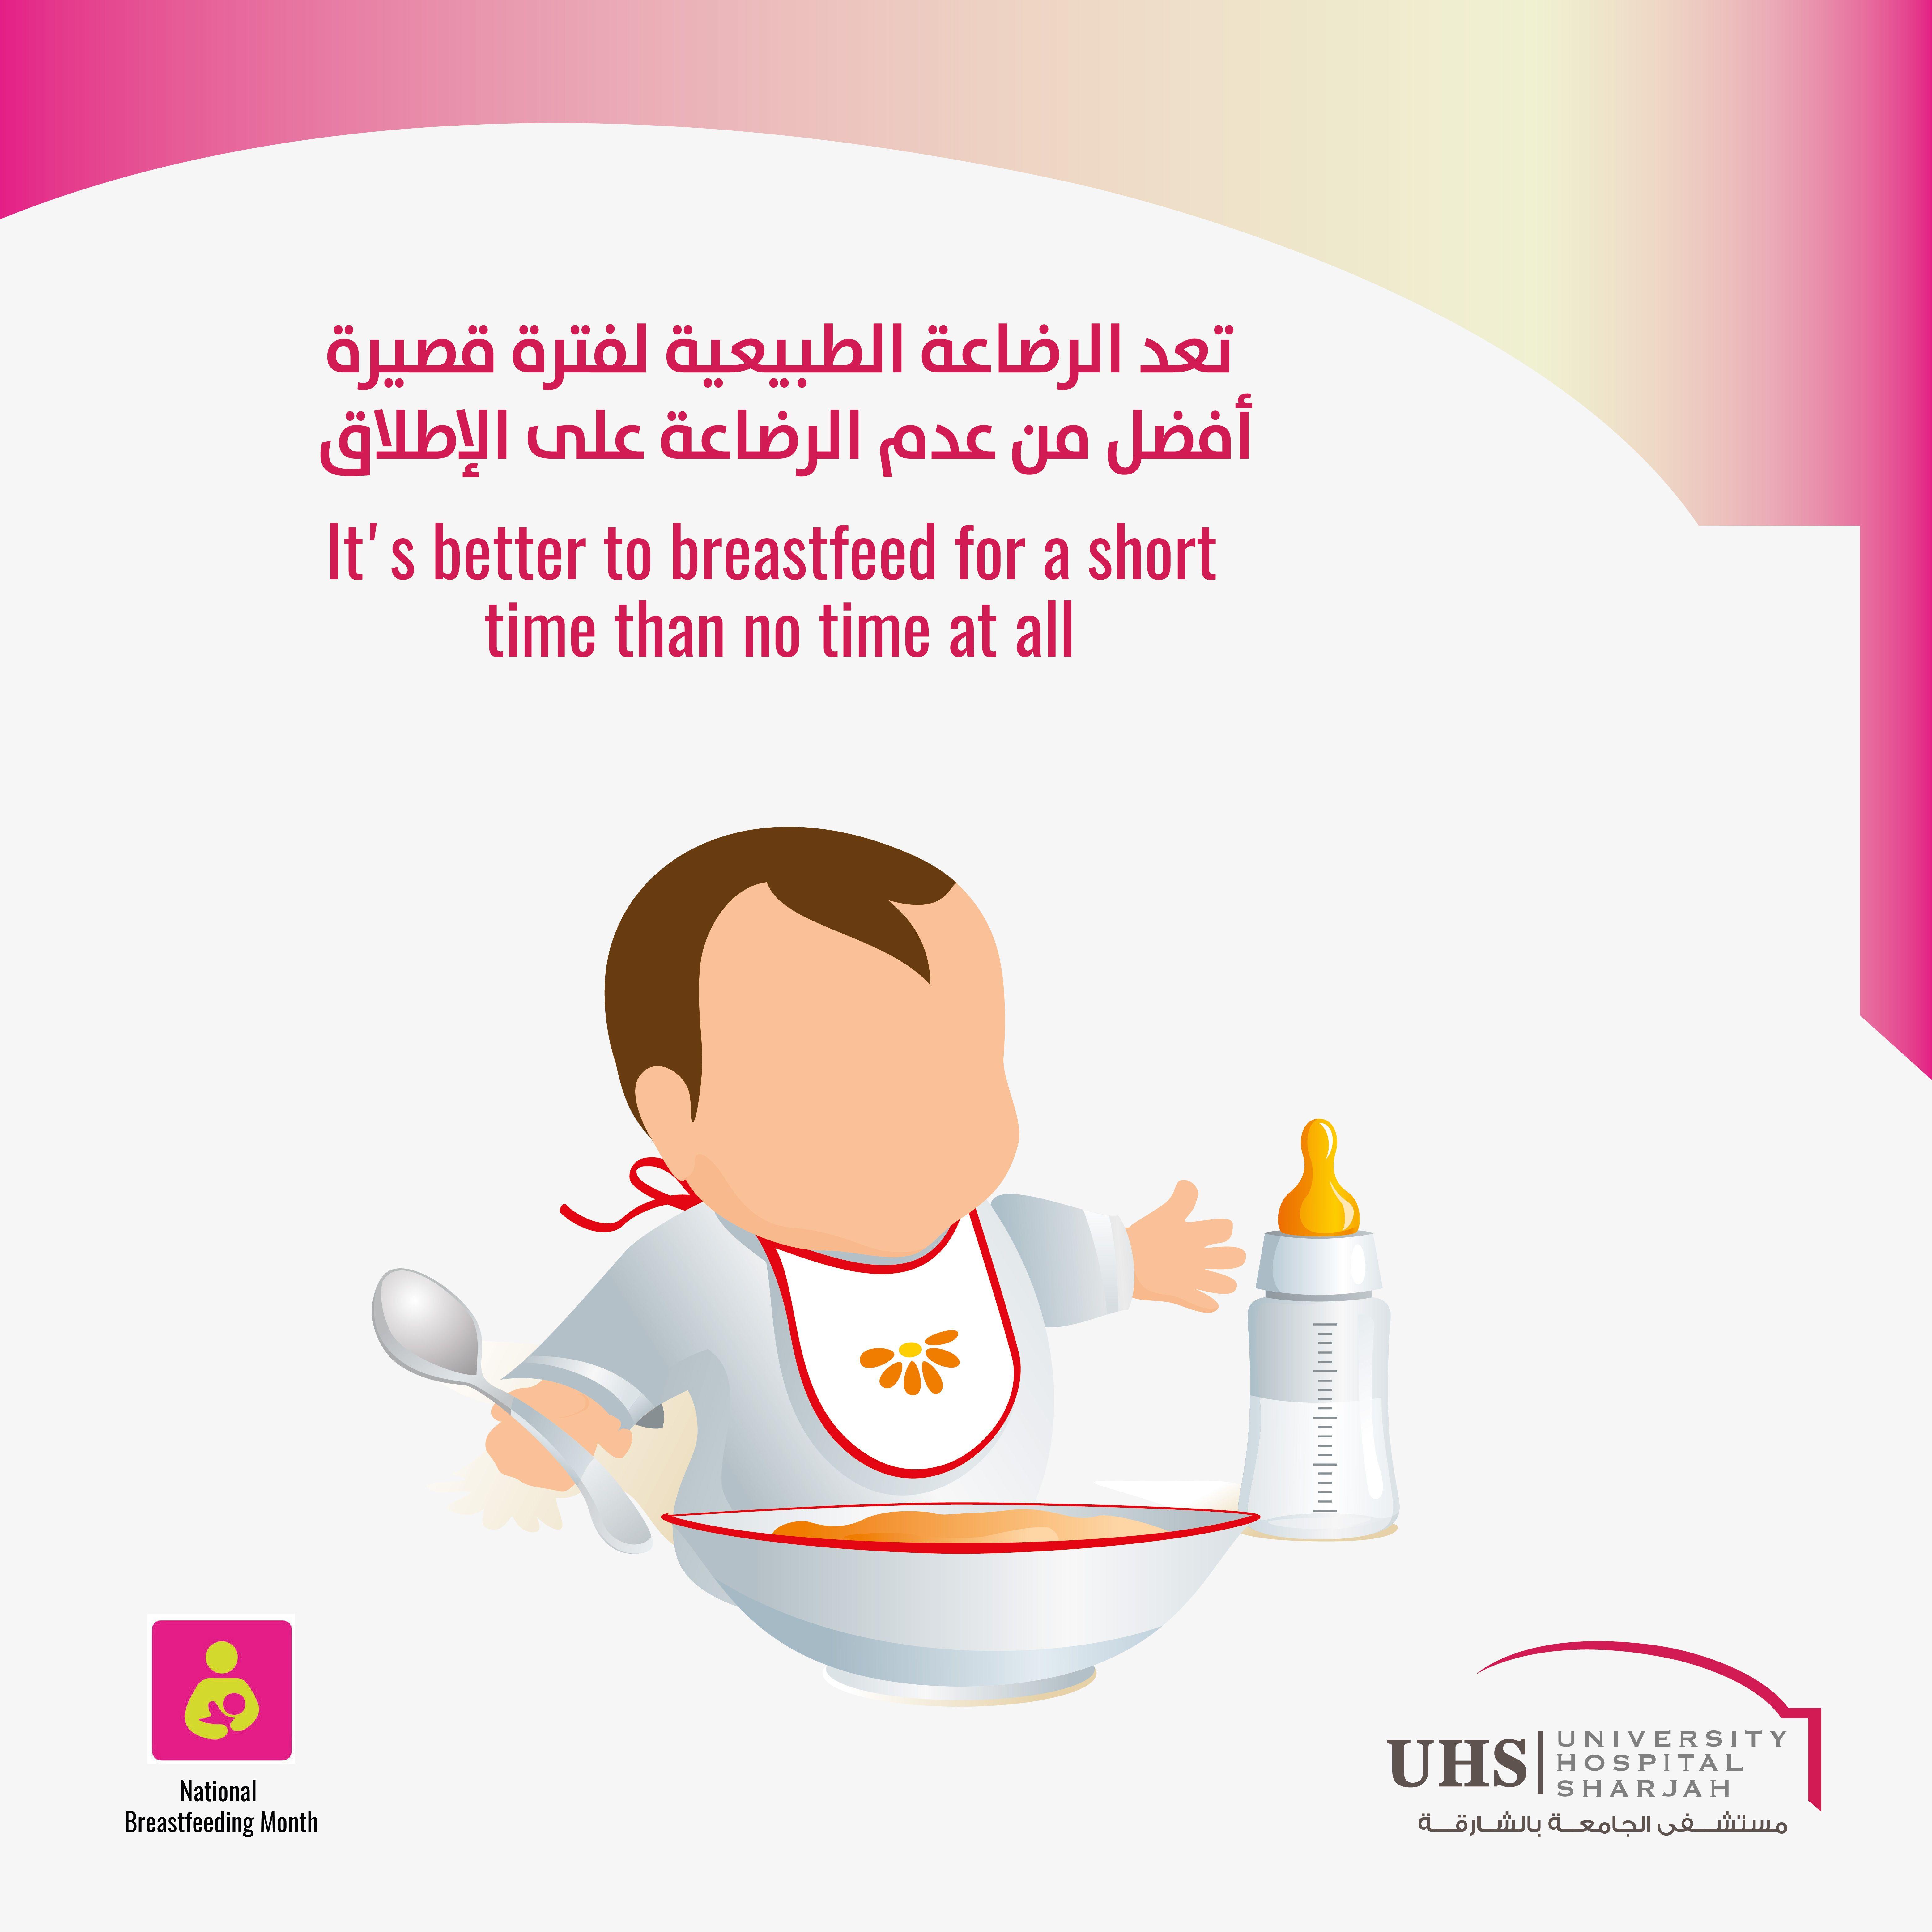 Pin By University Hospital Sharjah On Breastfeeding Awareness Month Breastfeeding Awareness Breastfeeding Awareness Month Breastfeeding